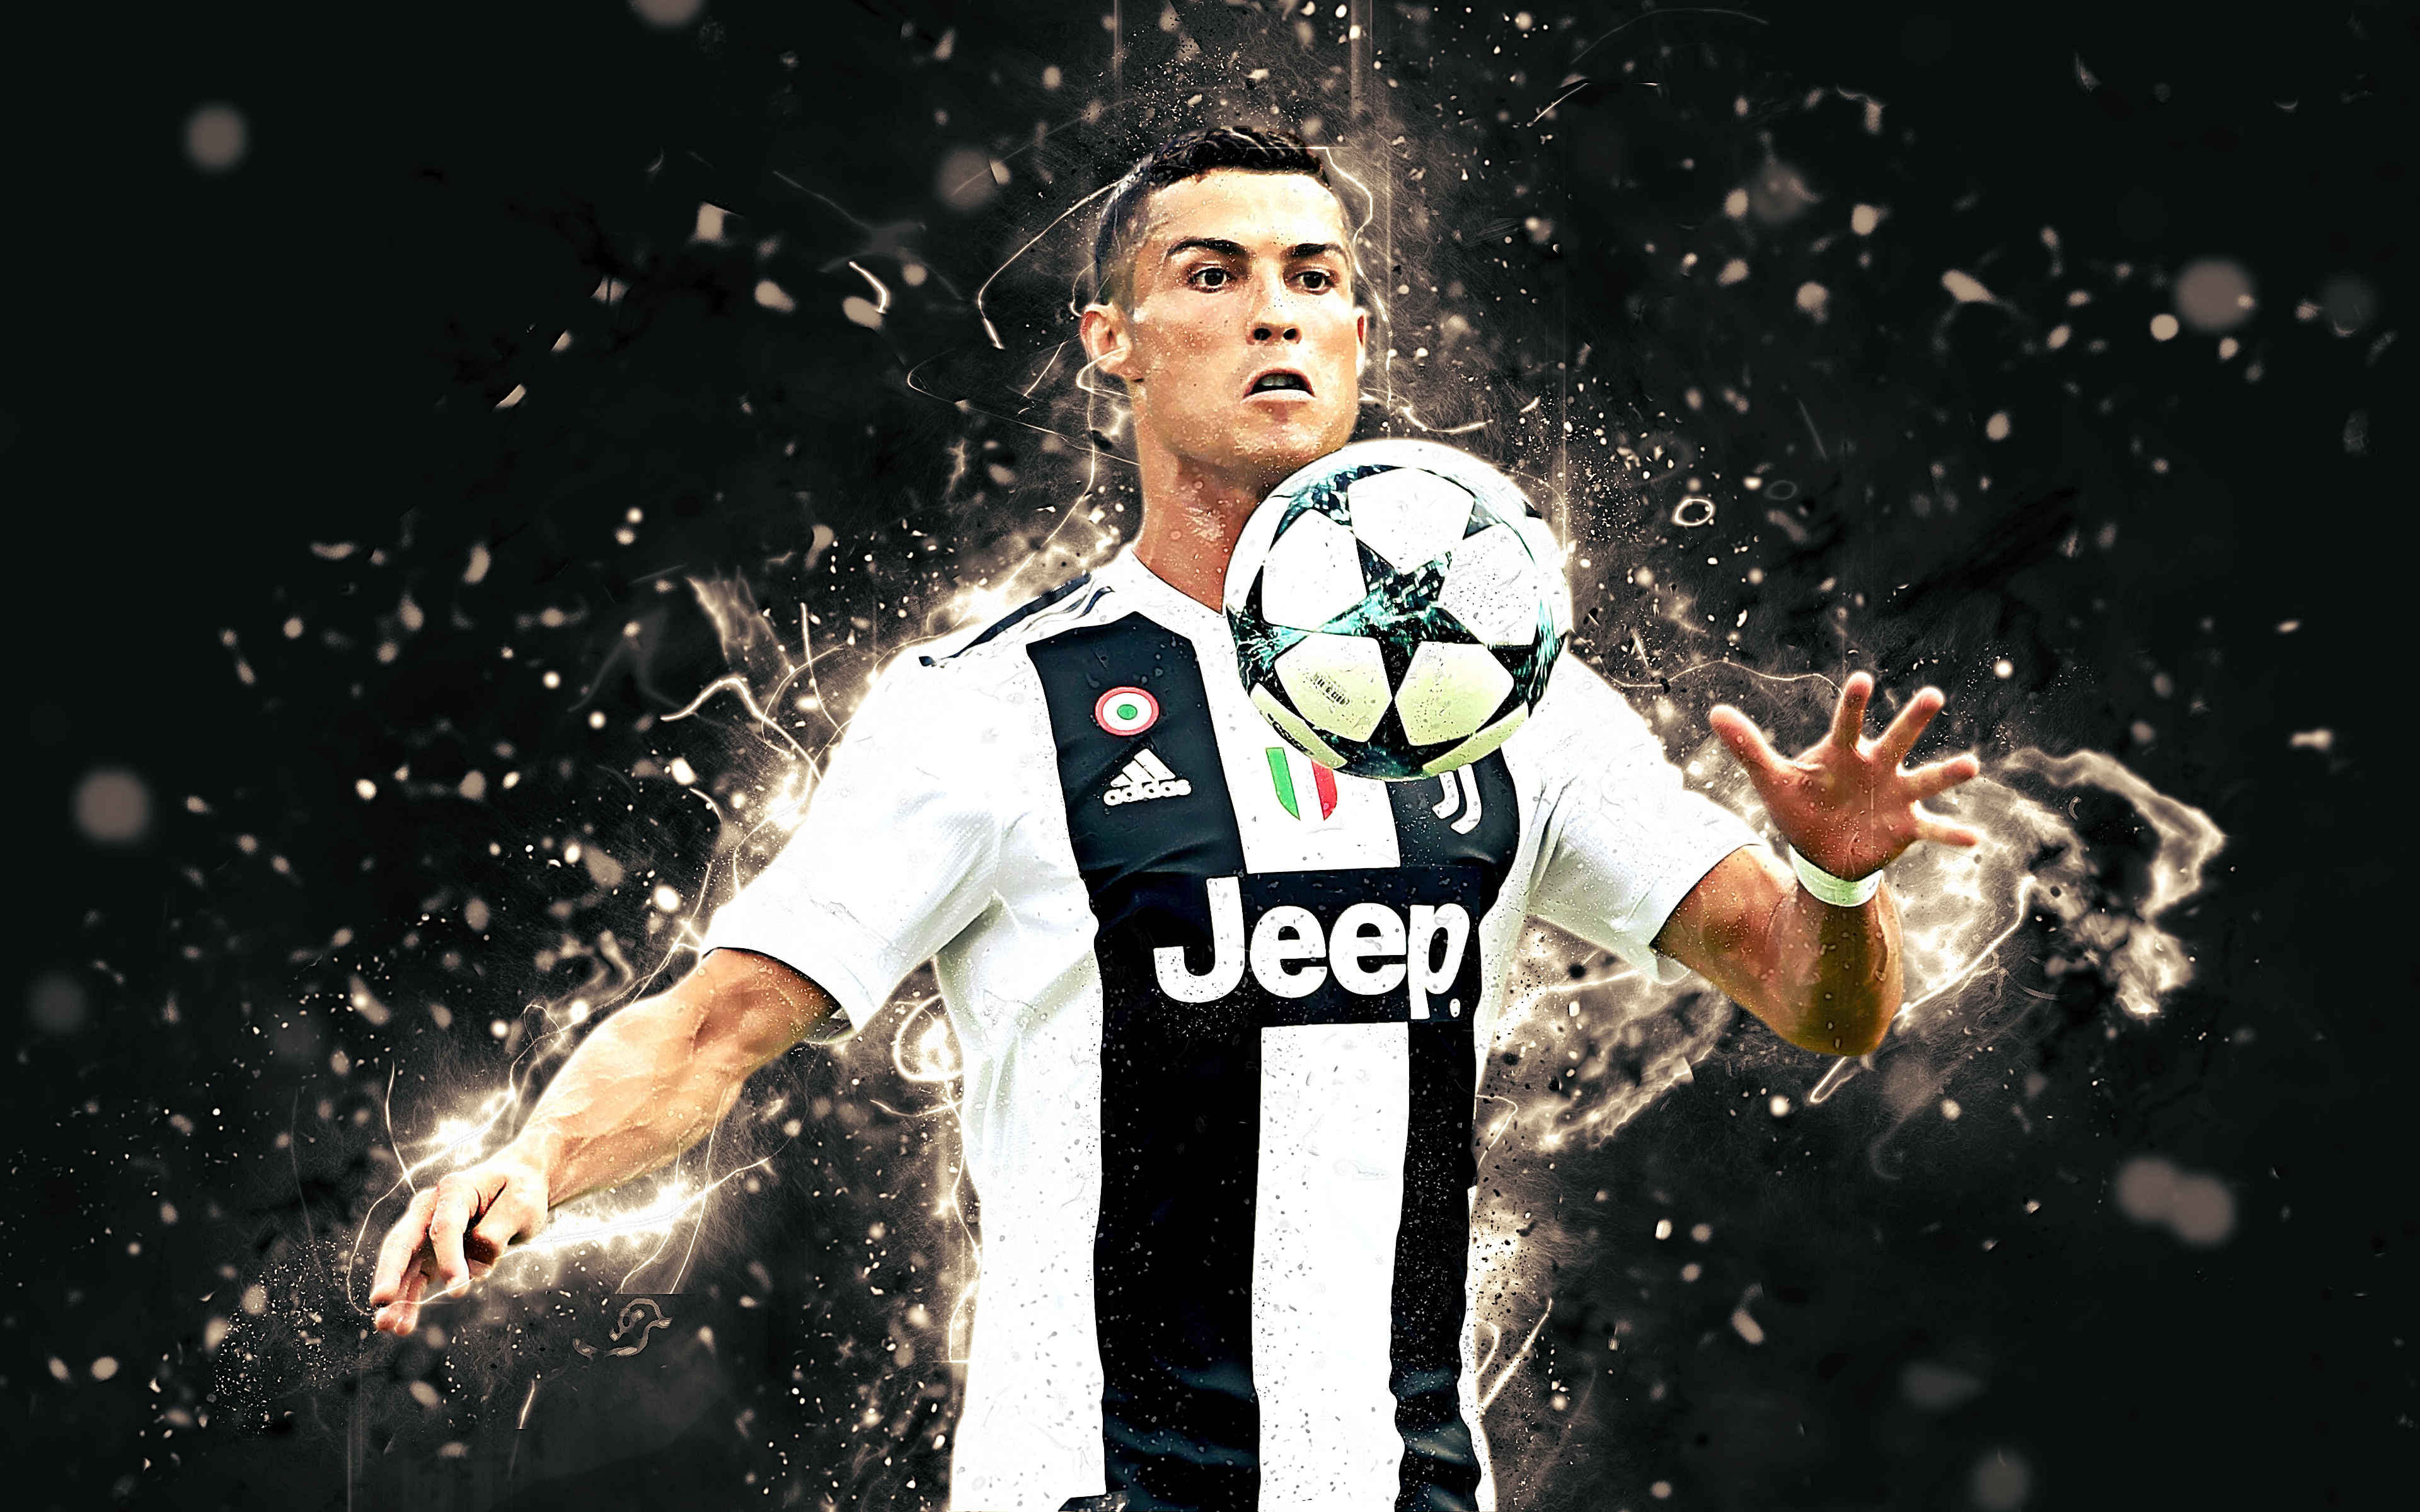 Cristiano Ronaldo Juventus 4k Ultra Hd Wallpaper Background Image 3840x2400 Id 961851 Wallpaper Abyss